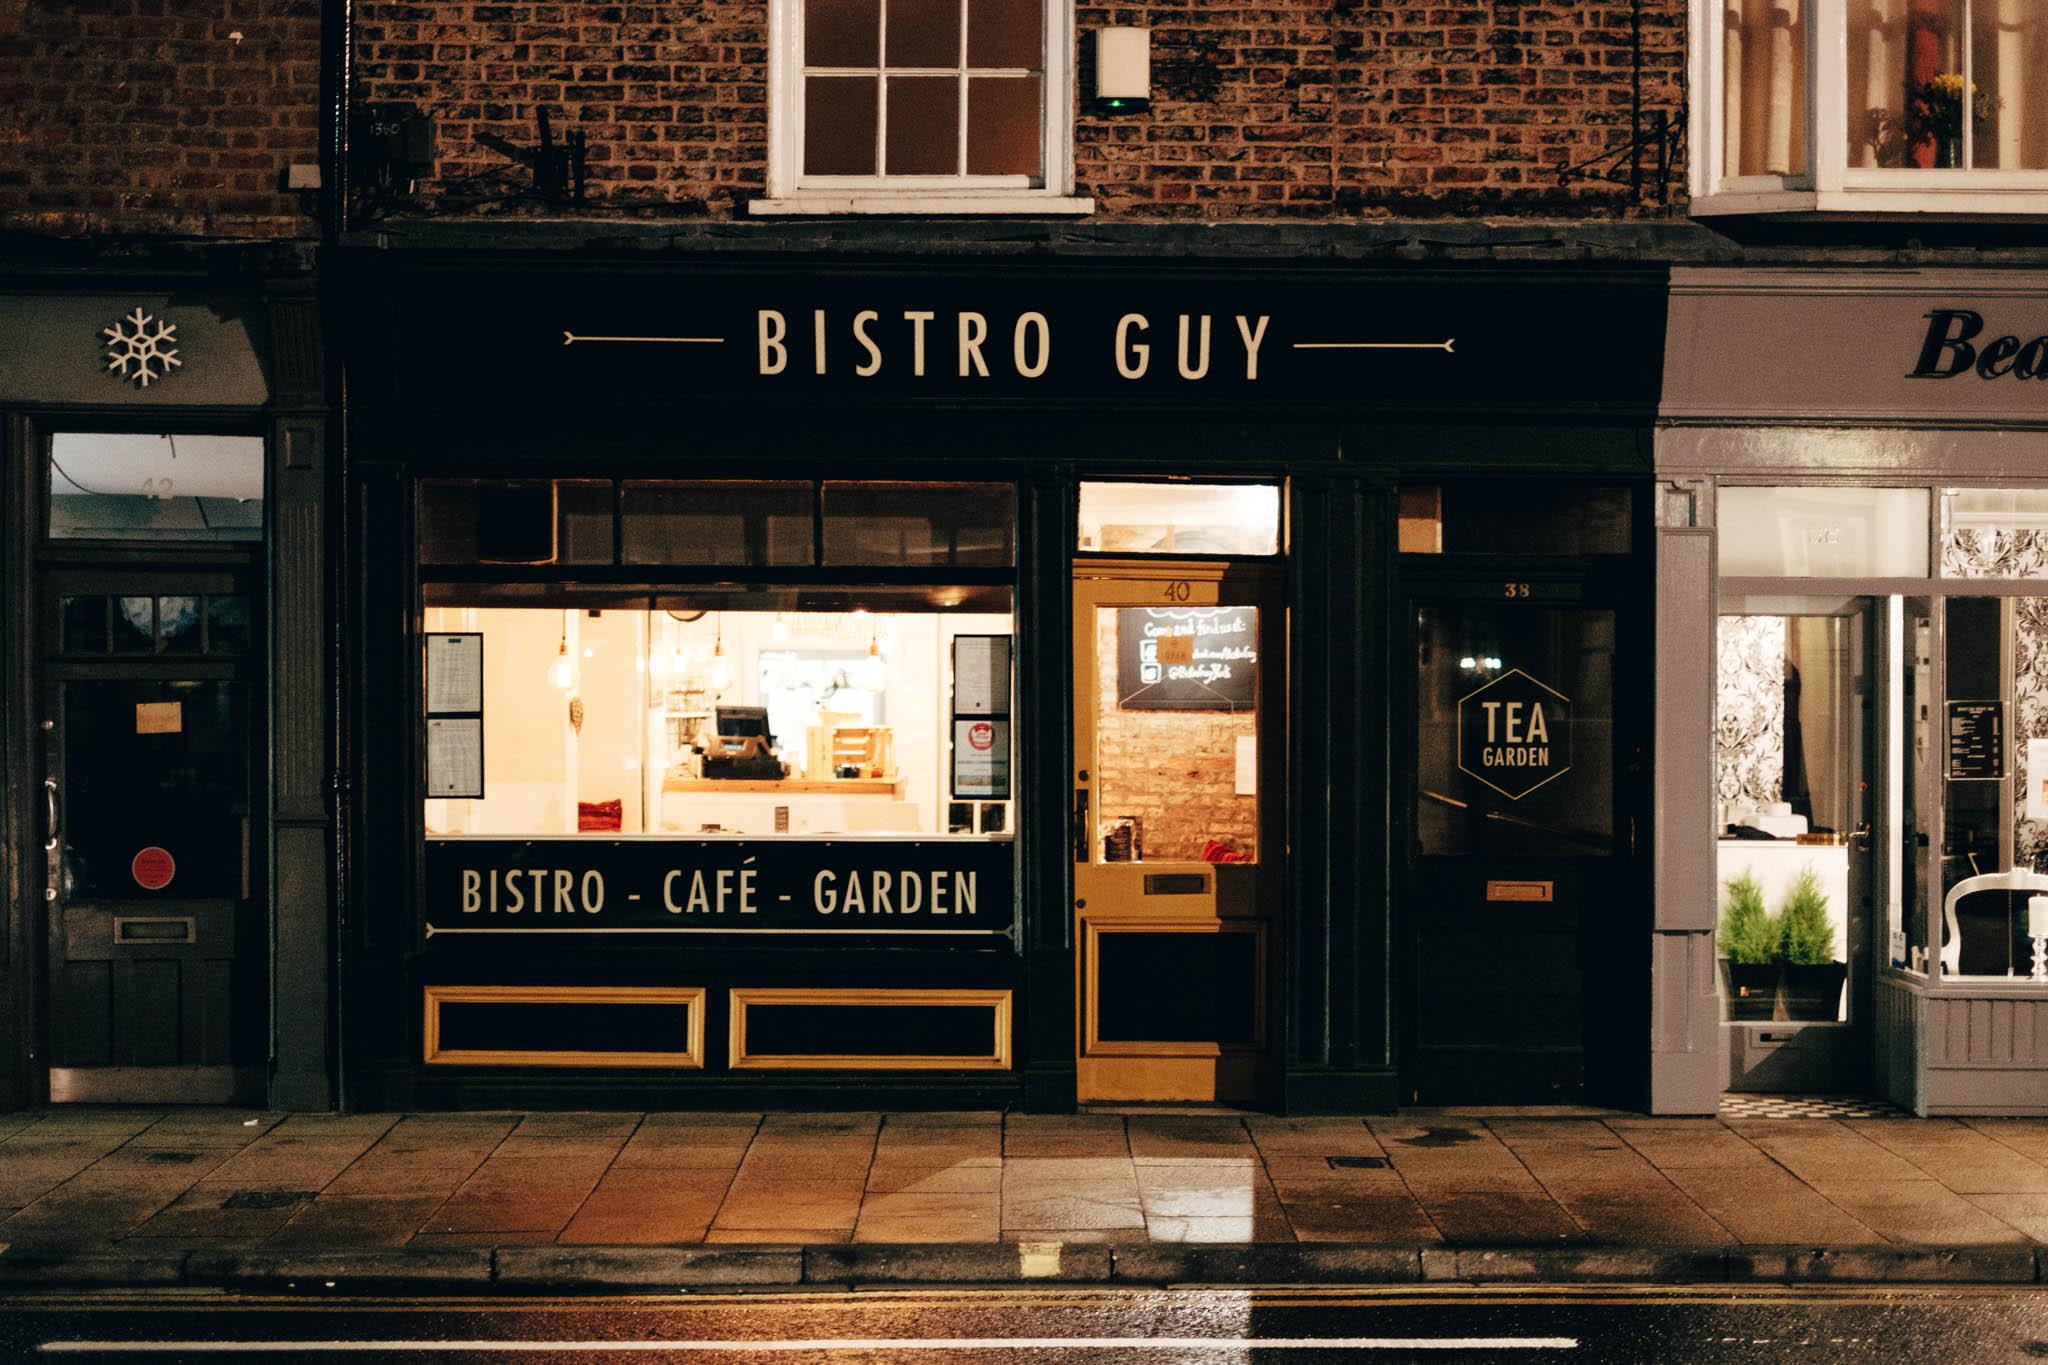 Bistro-Guy-York-161001-192813.jpg